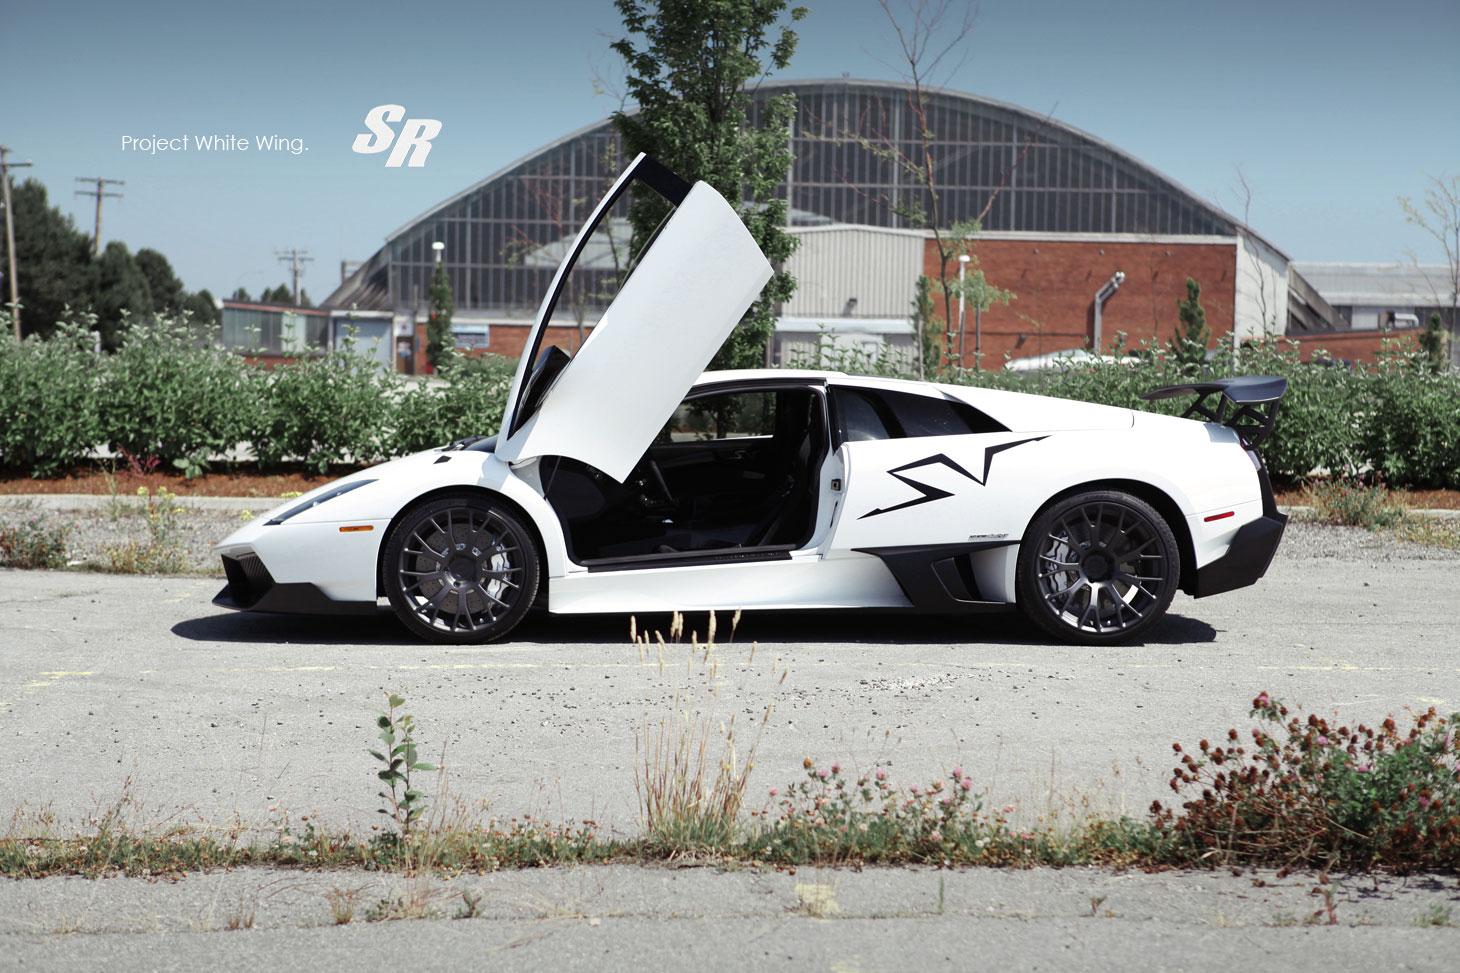 Lamborghini Murcielago LP670-4 SV jako Project White Wing 3